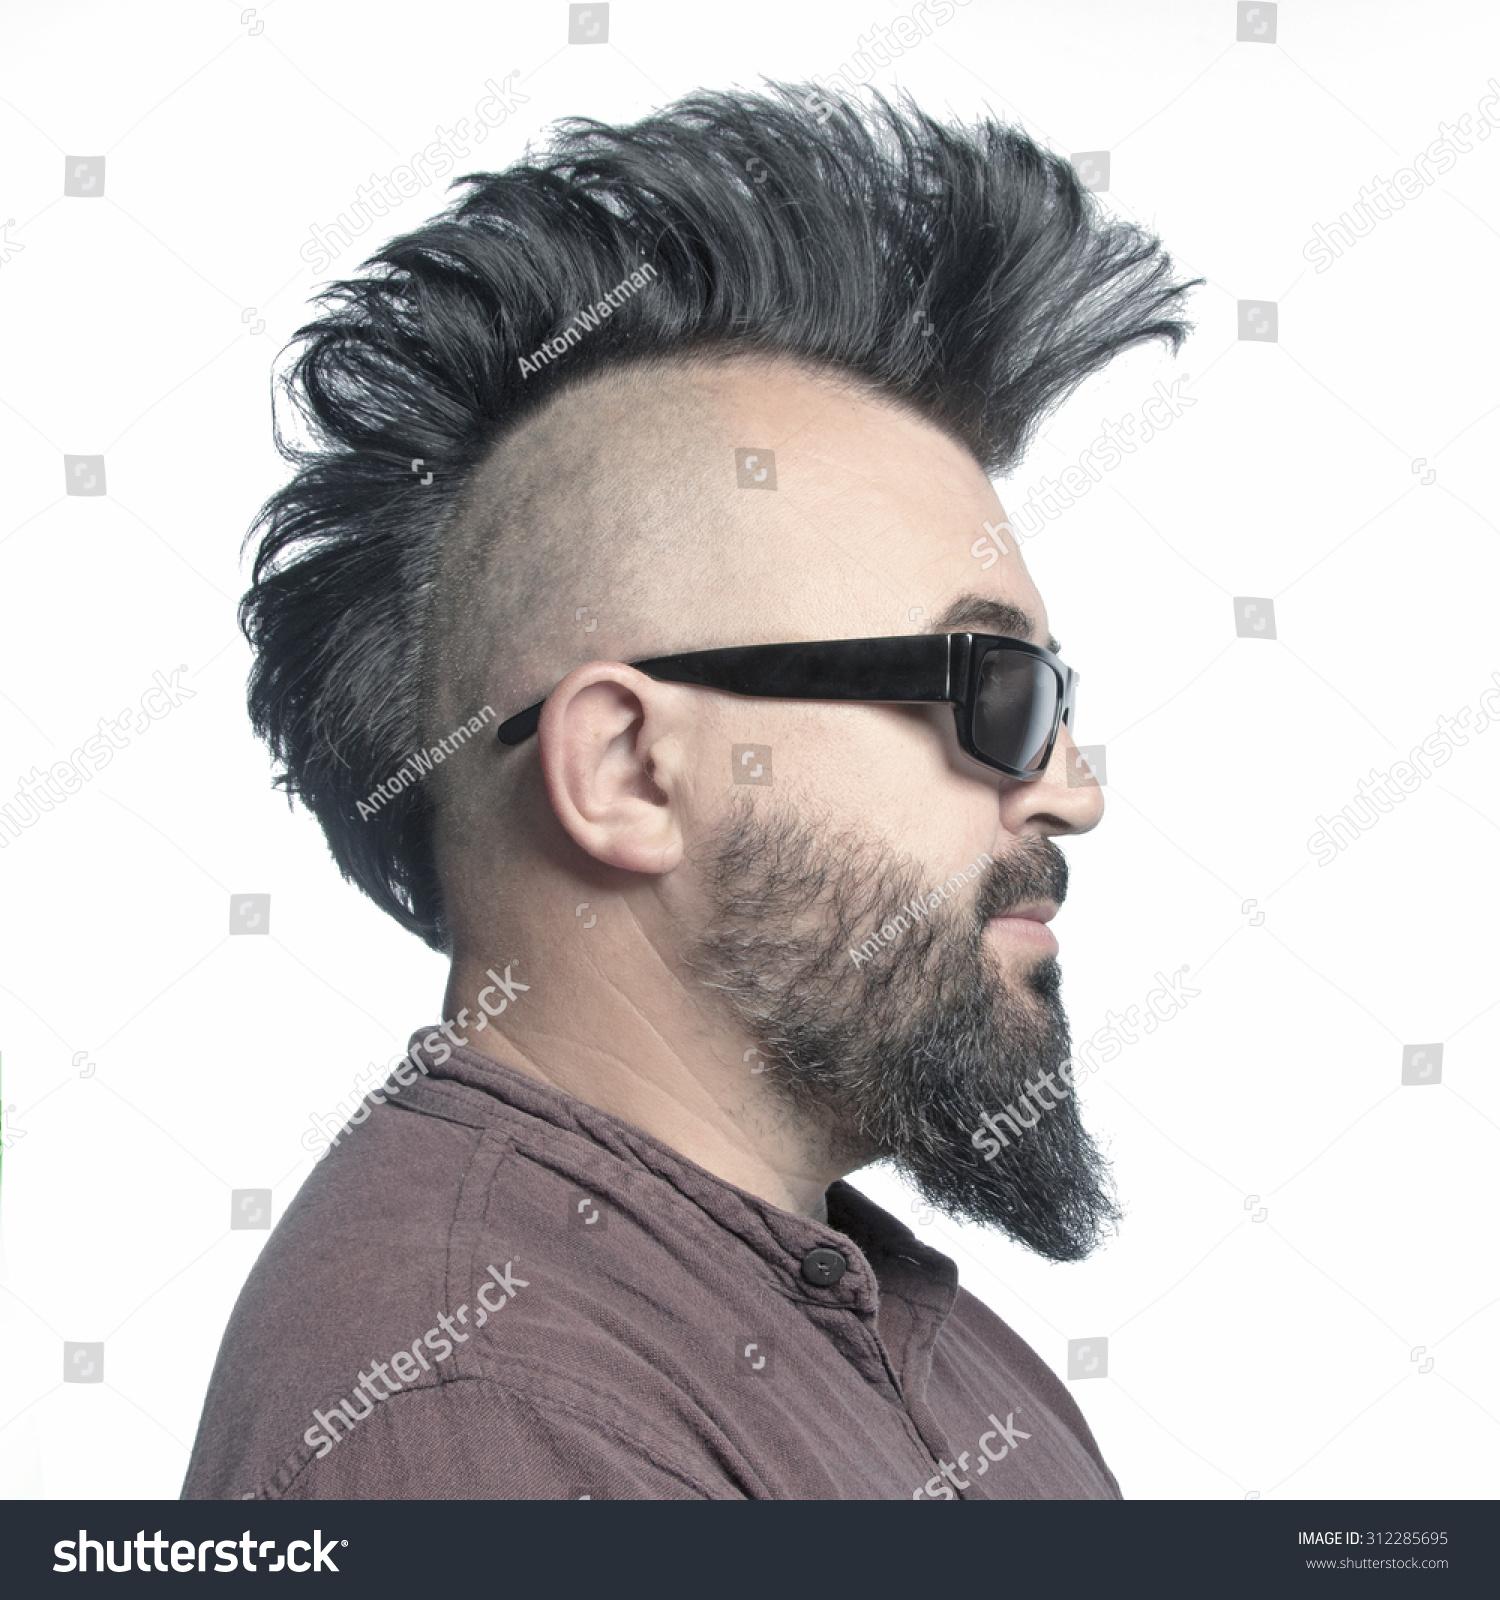 how to become a beard